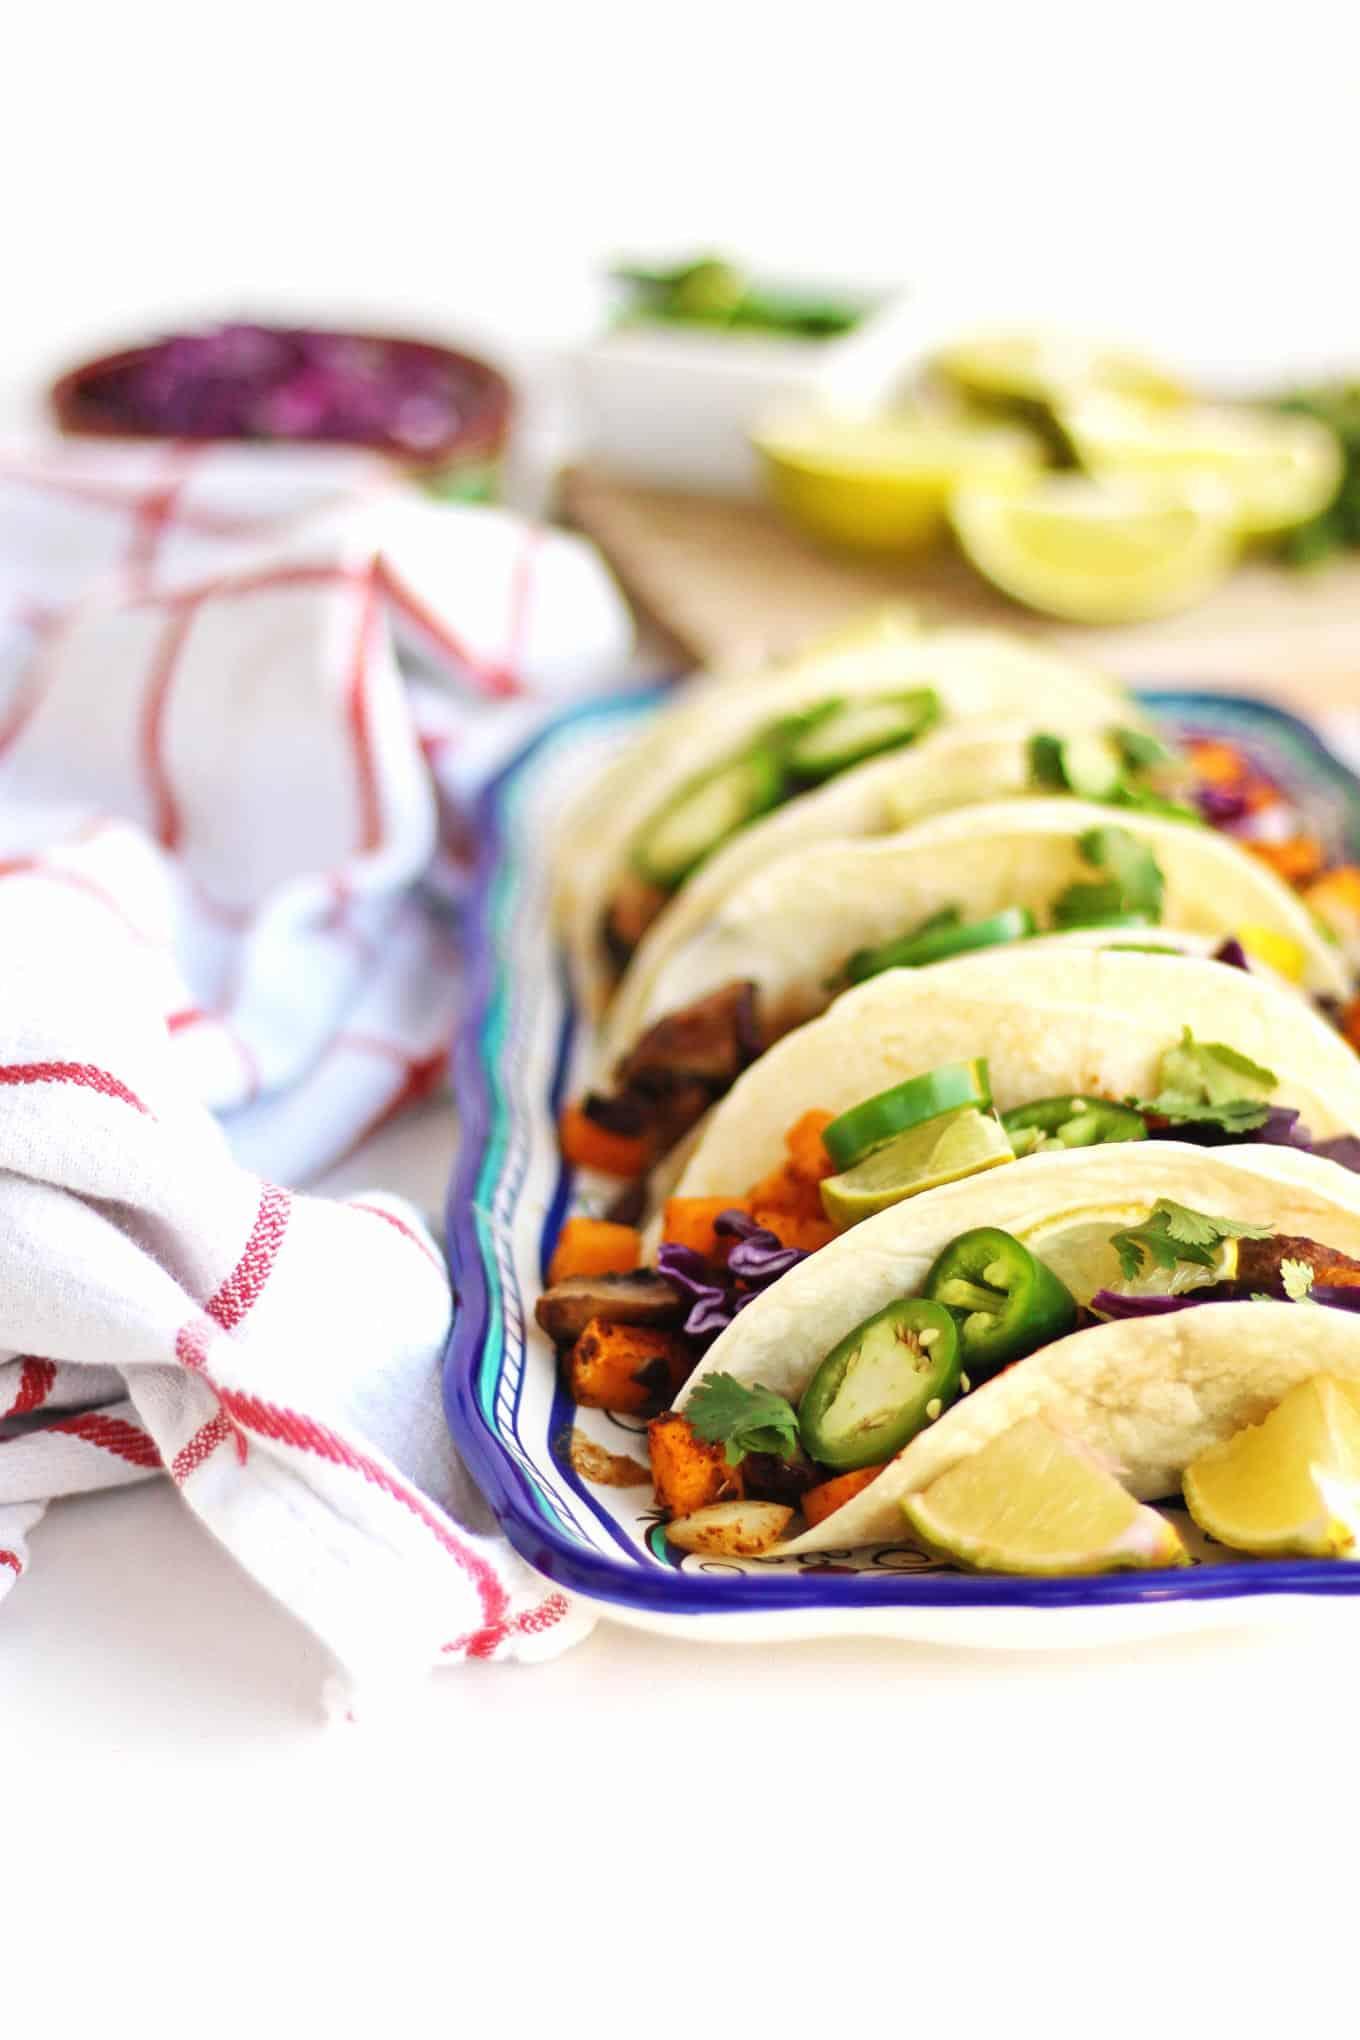 vegan black bean tacos on a plate